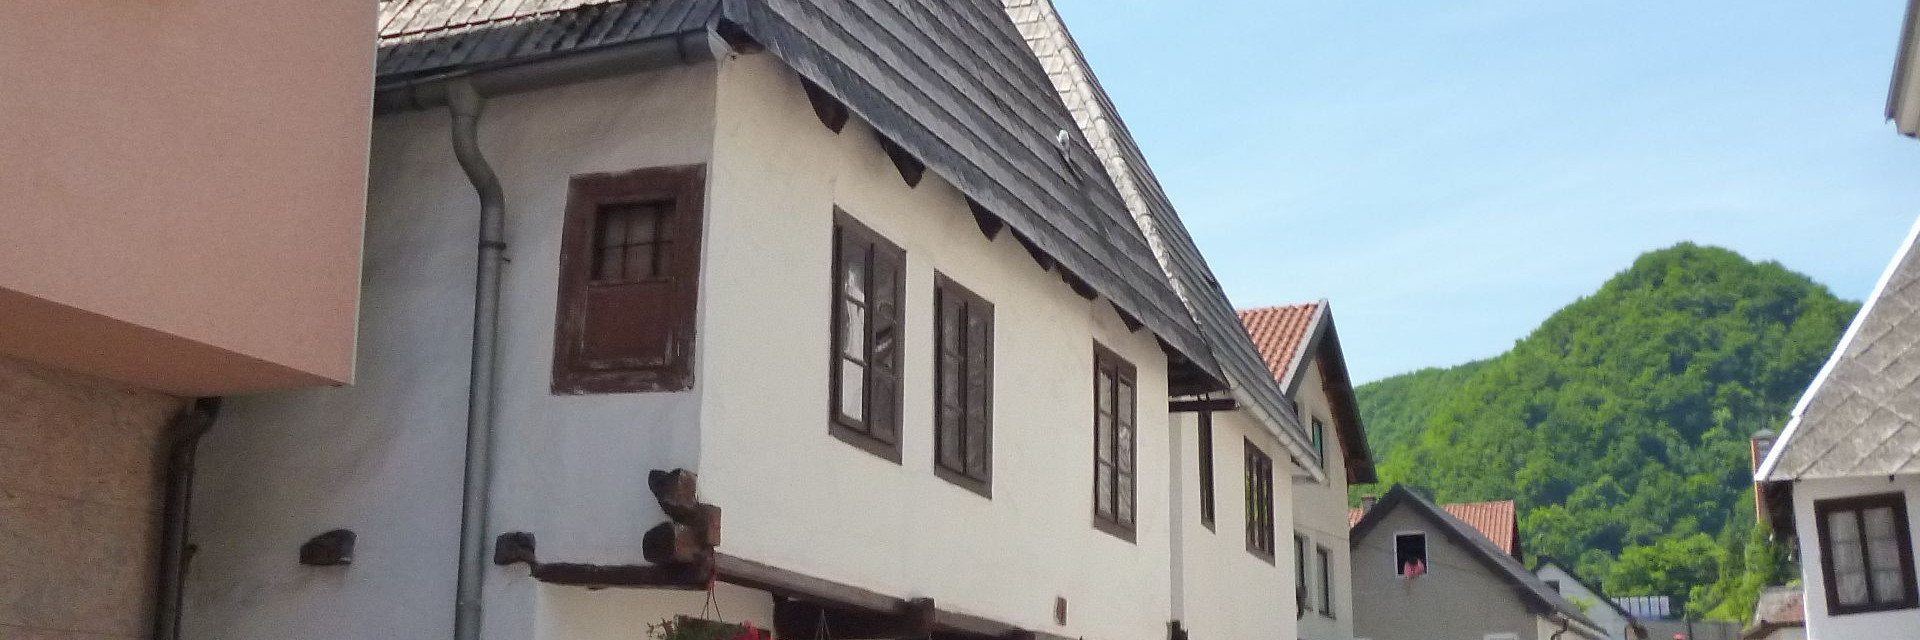 Антун Ханги о традиционной архитектуре